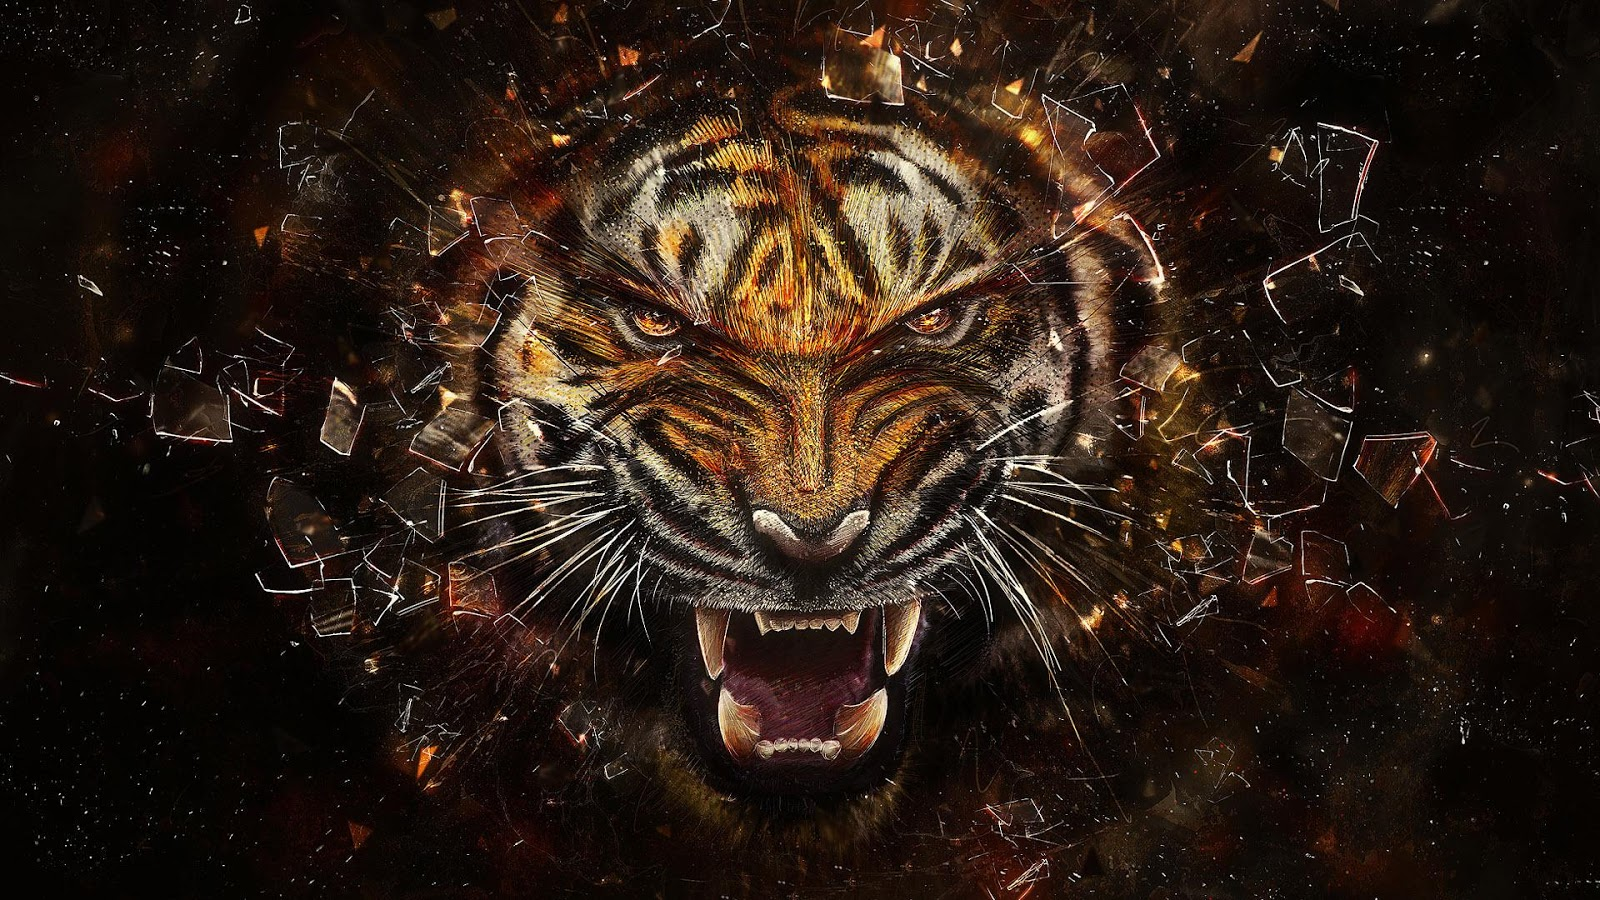 Imagenes de tigres para fondo de pantalla hd fondos de for De pantalla fondos de pantalla